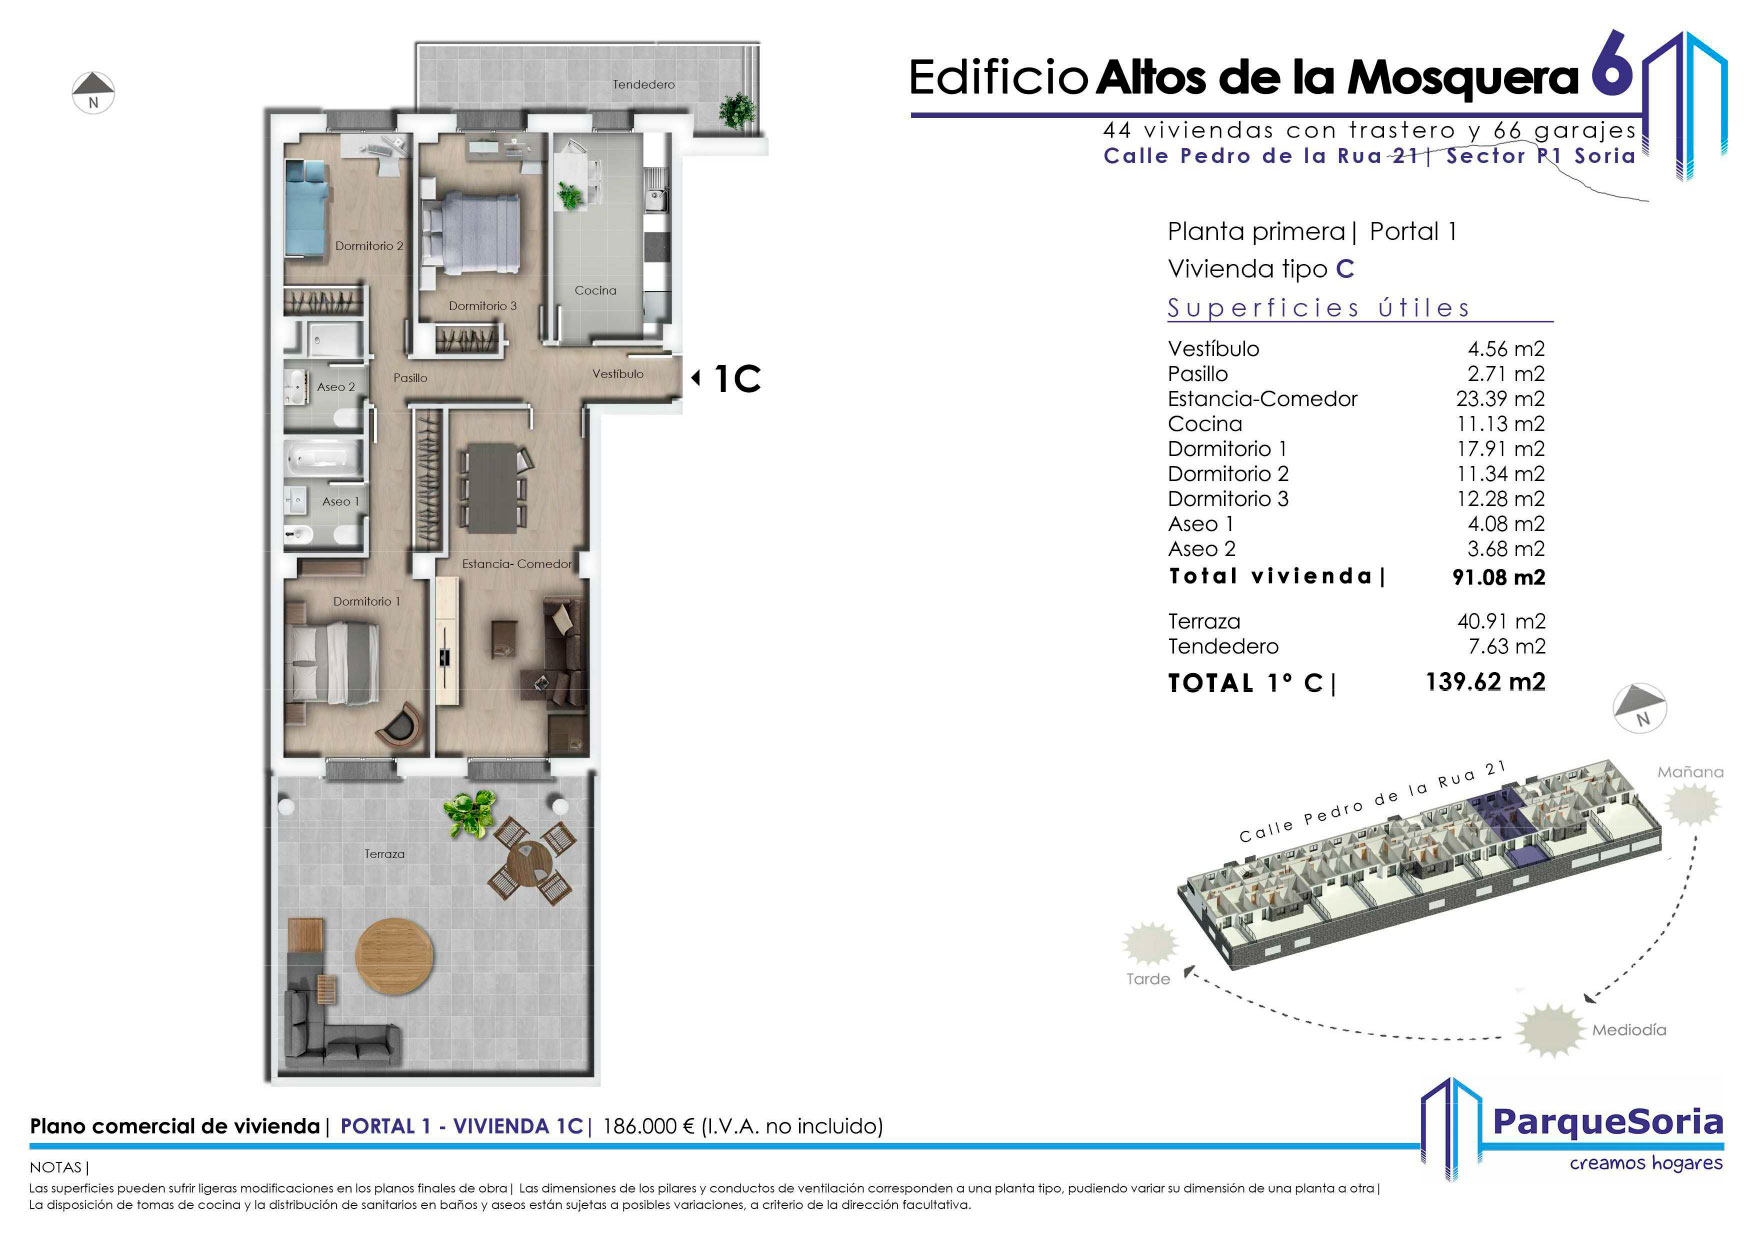 Parquesoria-Altos-de-la-mosquera-6-1C-2